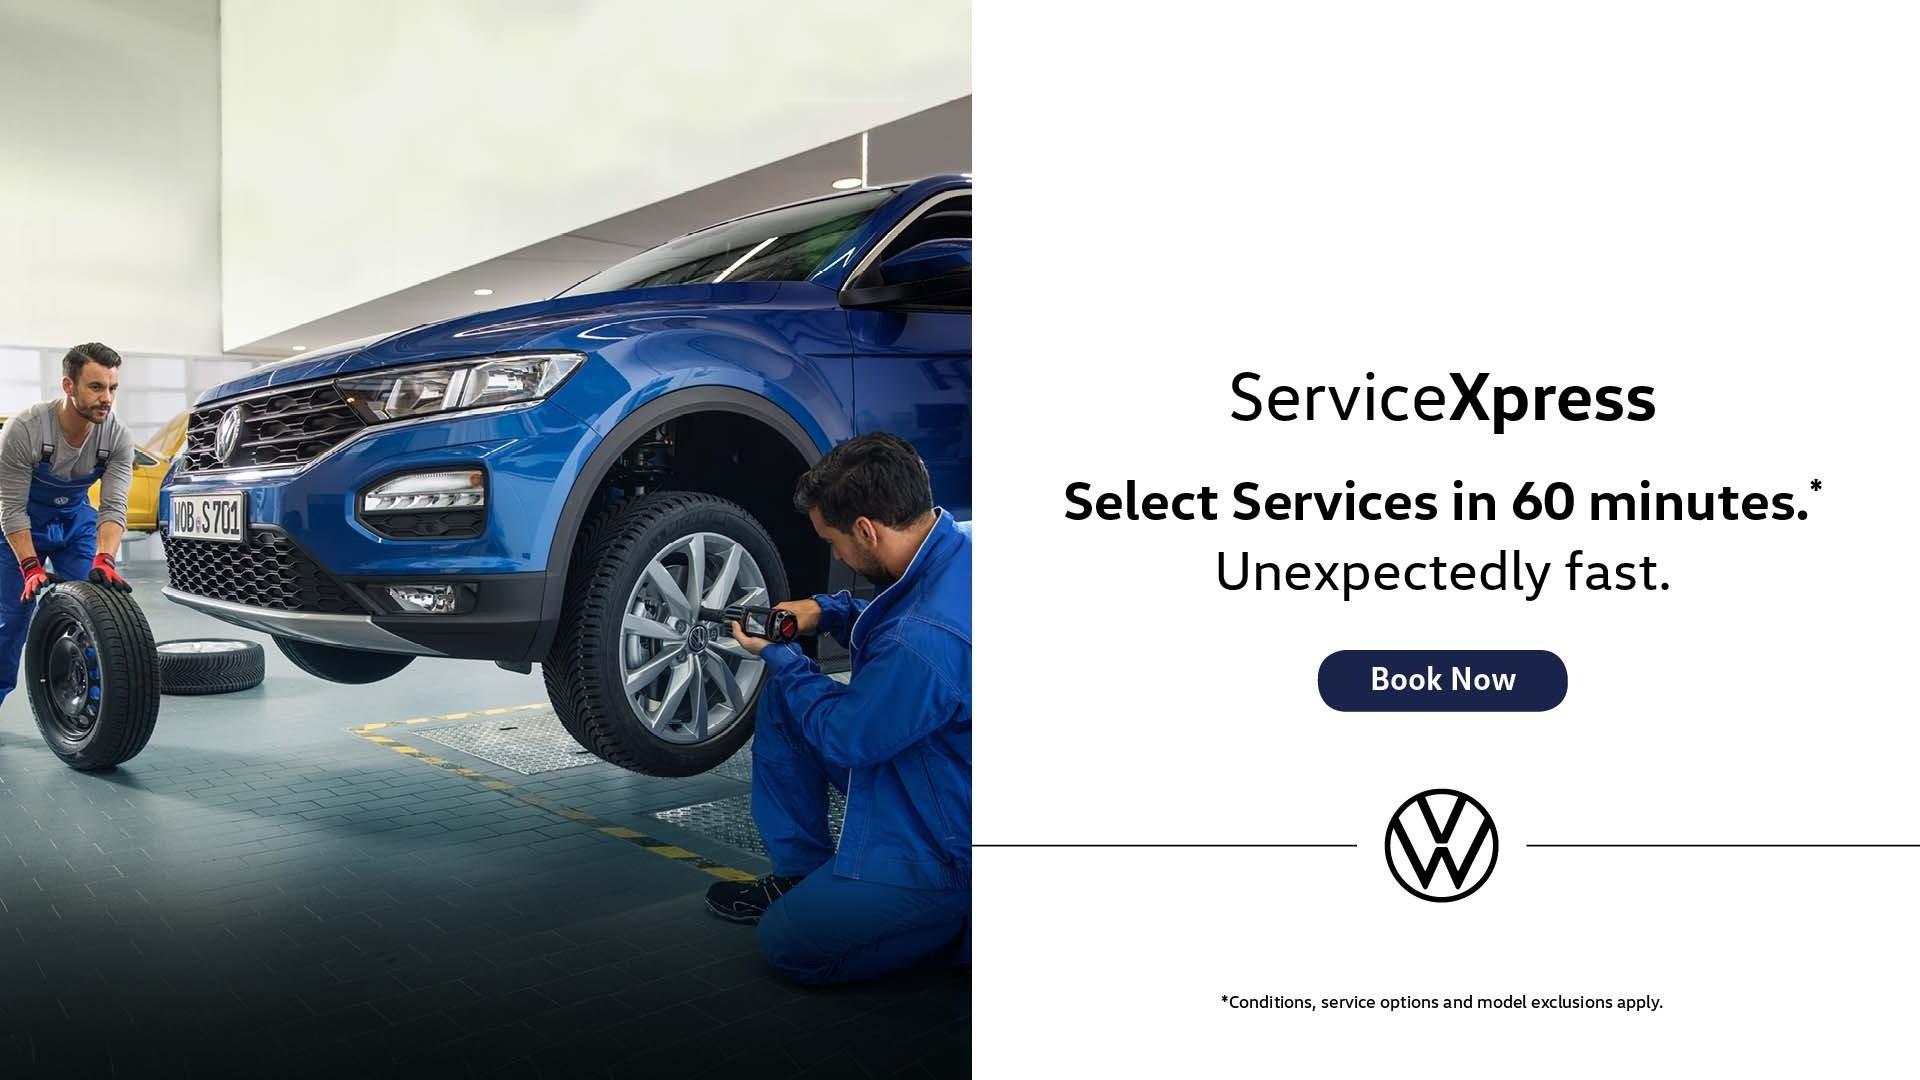 ServiceXpress